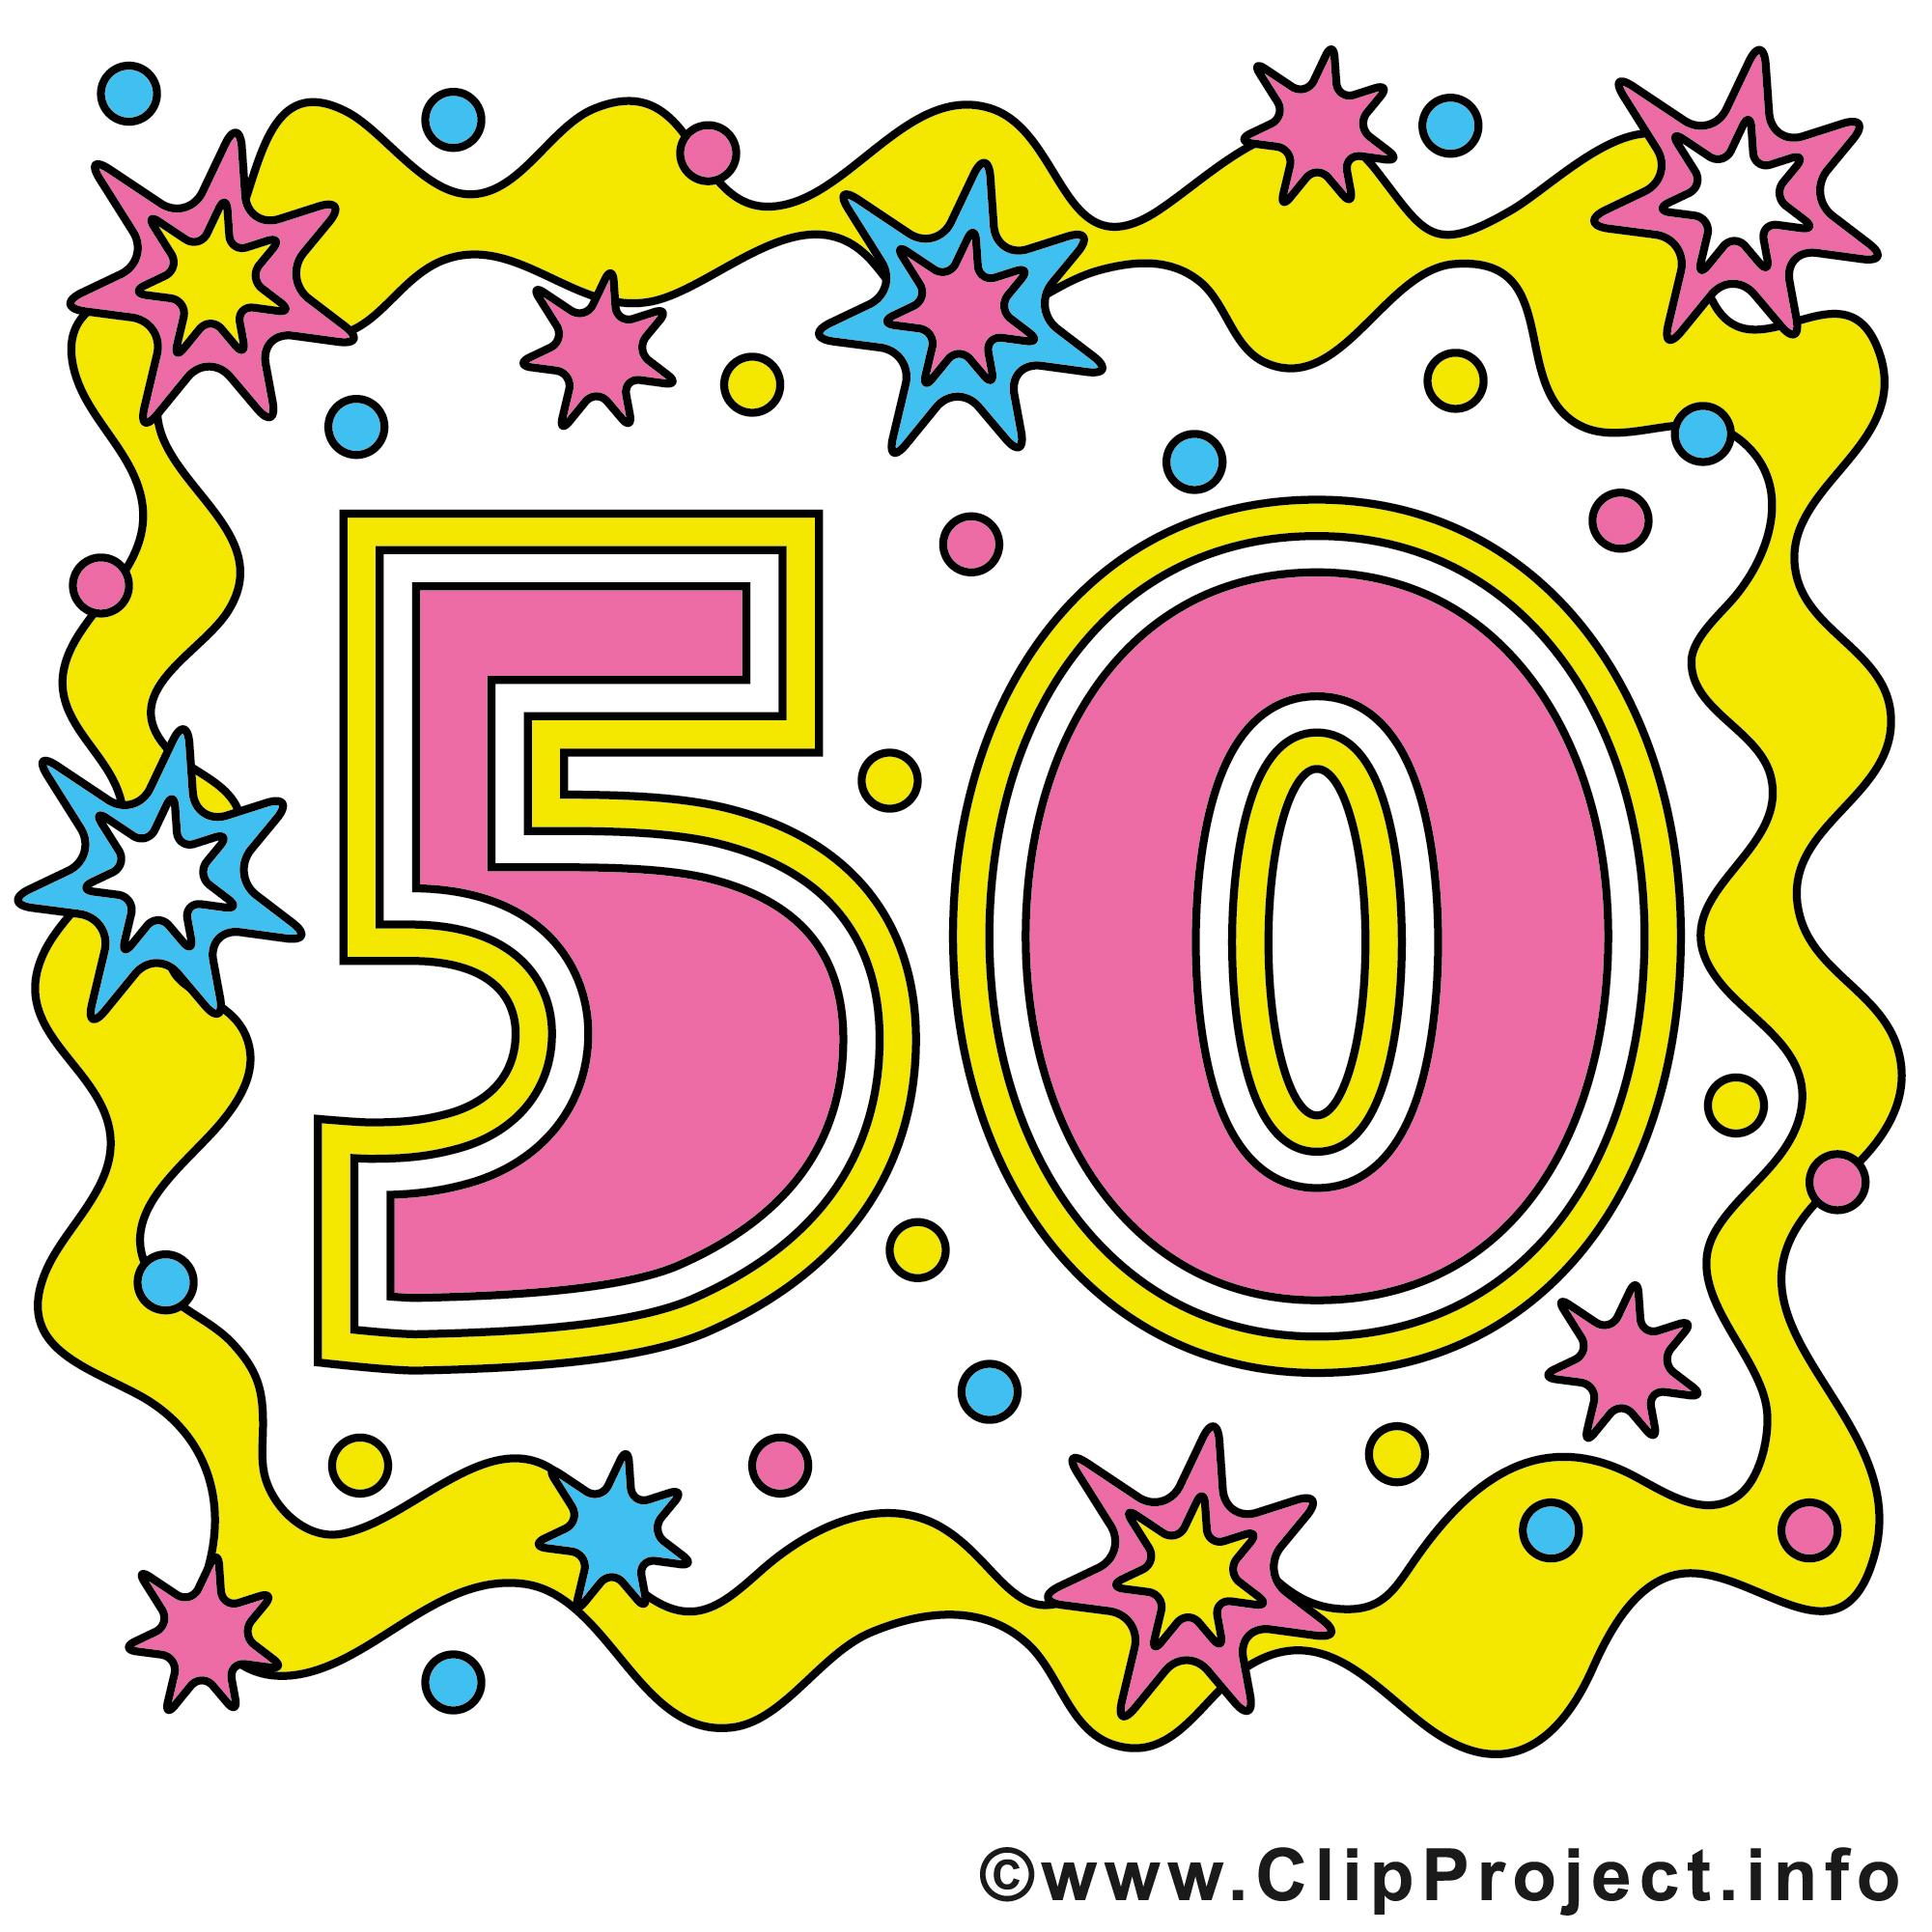 50 50 Clipart.